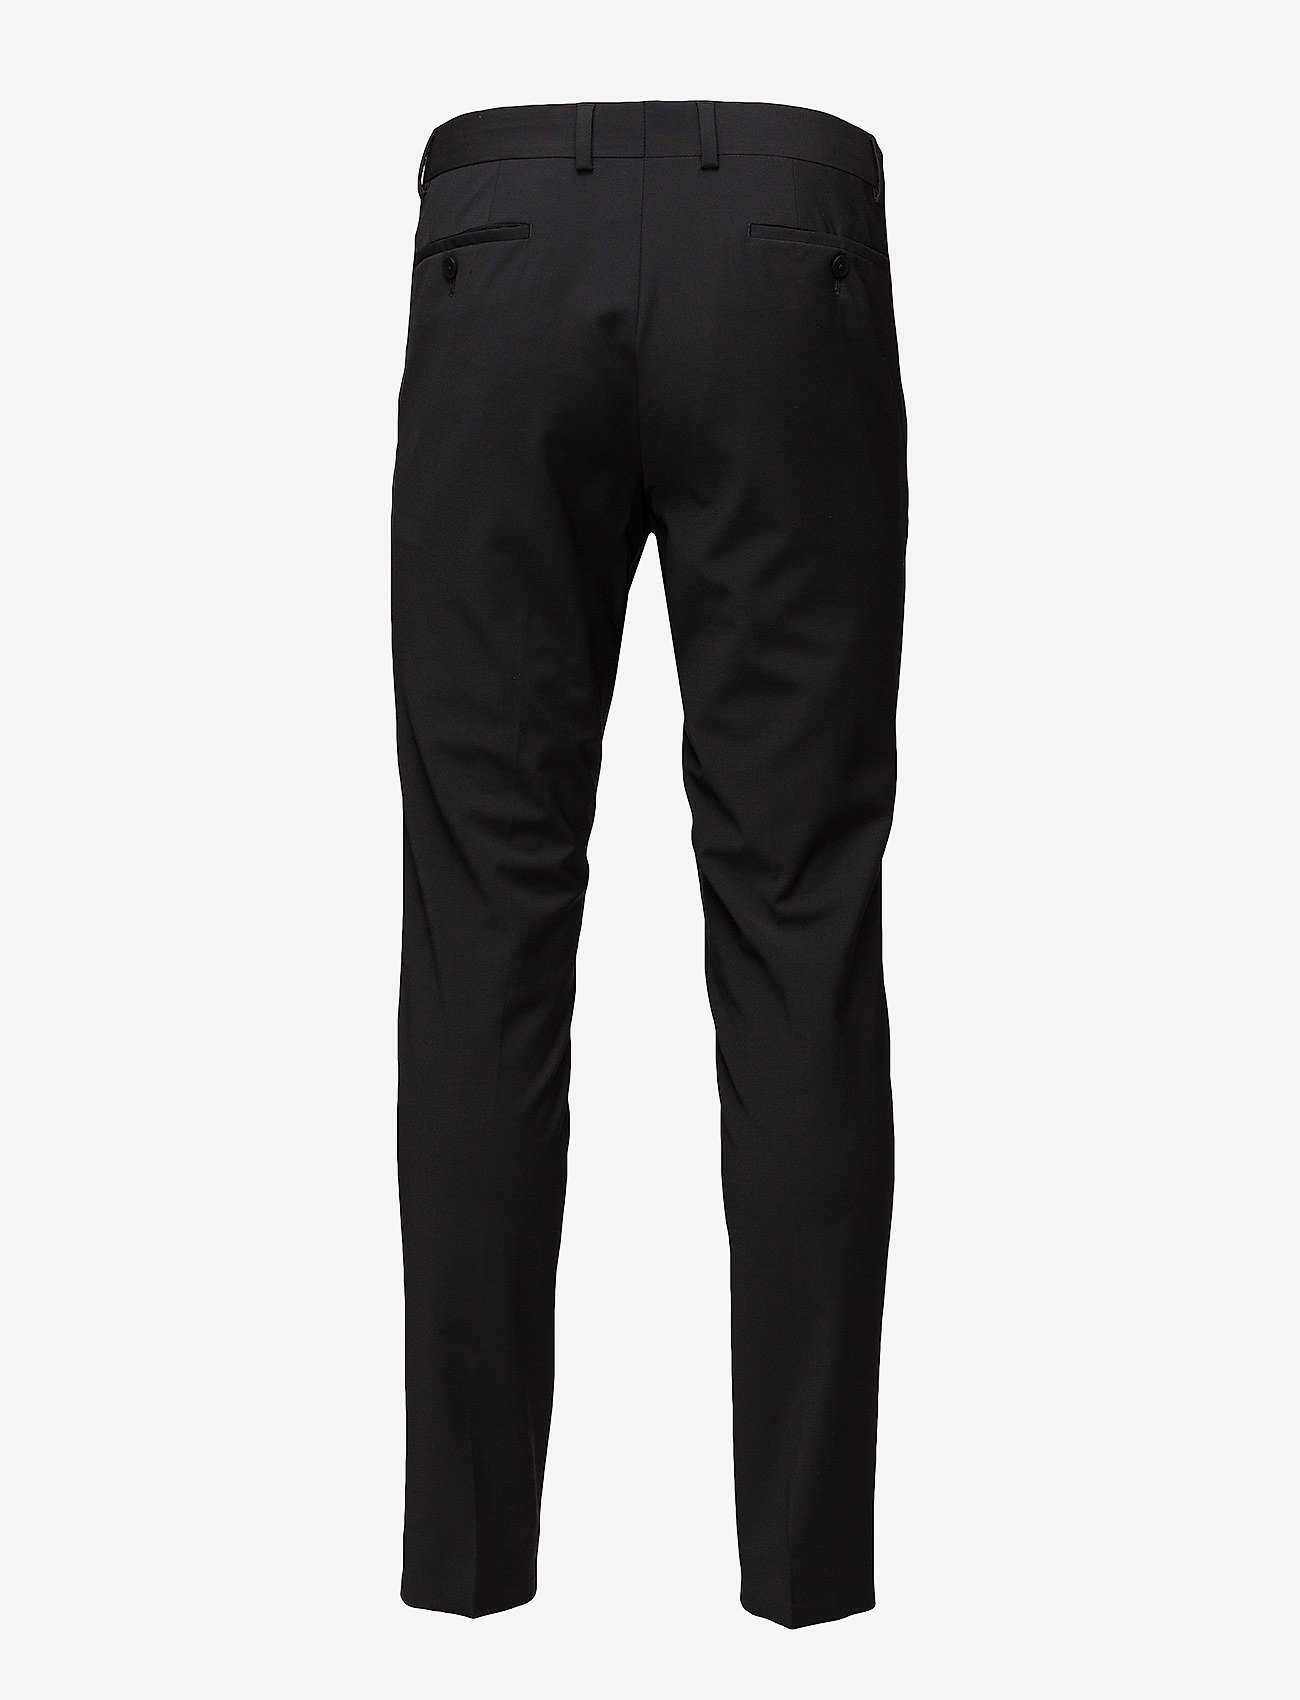 Esprit Collection - Pants suit - formele broeken - black - 1